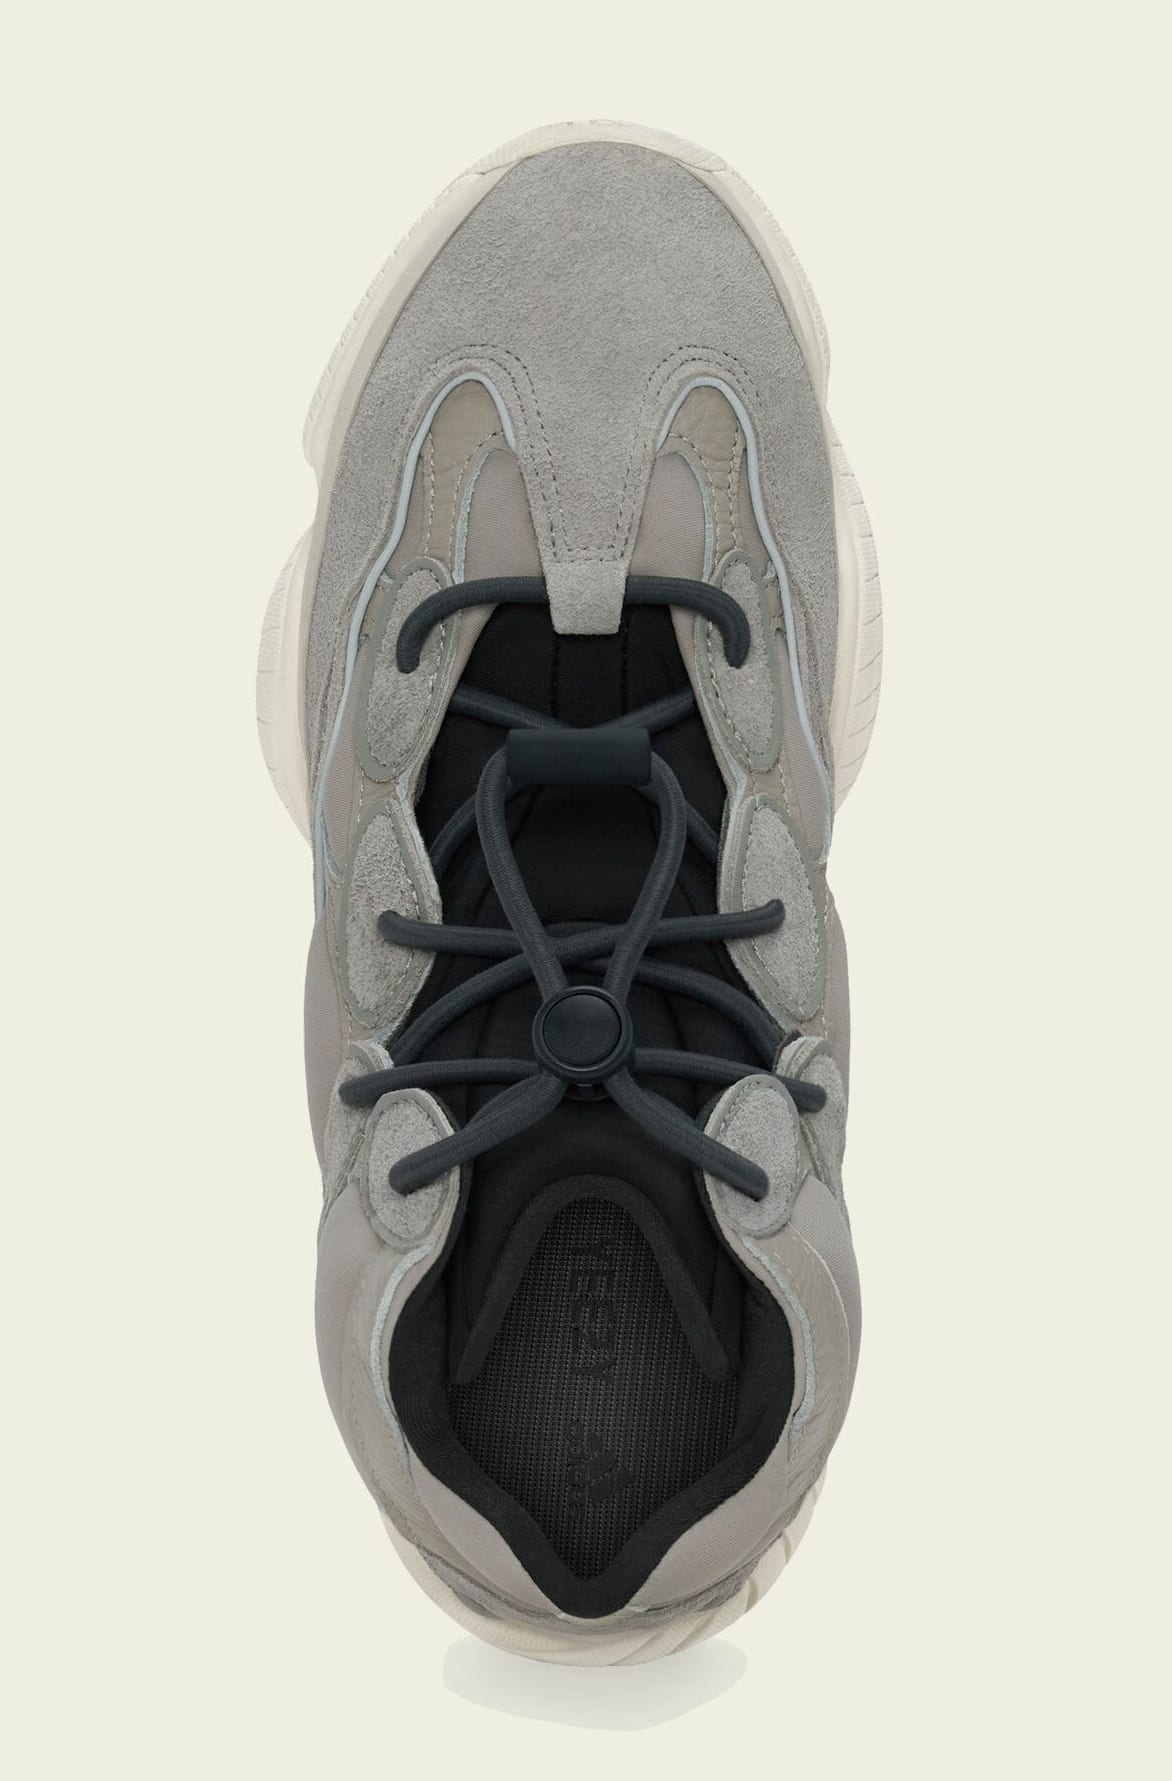 Adidas Yeezy 500 High 'Mist Stone' Top